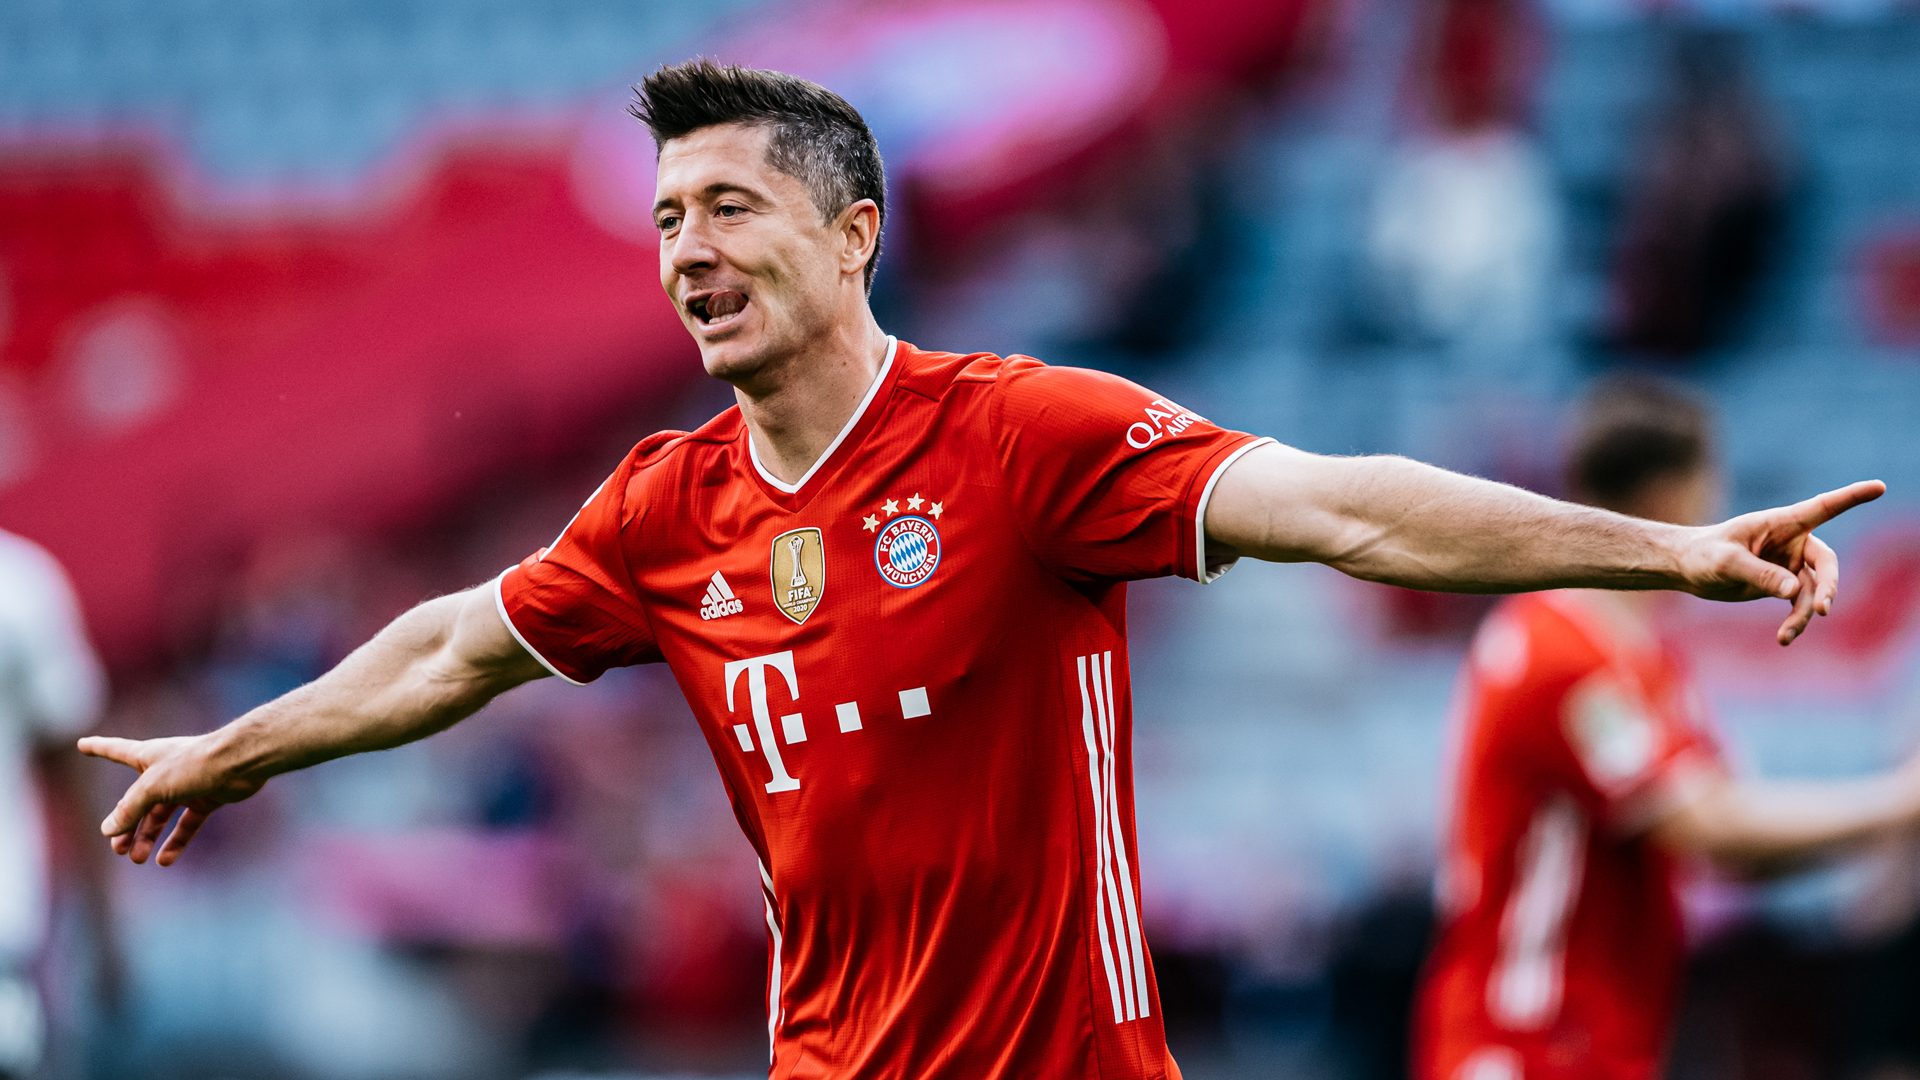 Bayern Munich defeated Borussia Dortmund  3-1  to win the German Super Cup